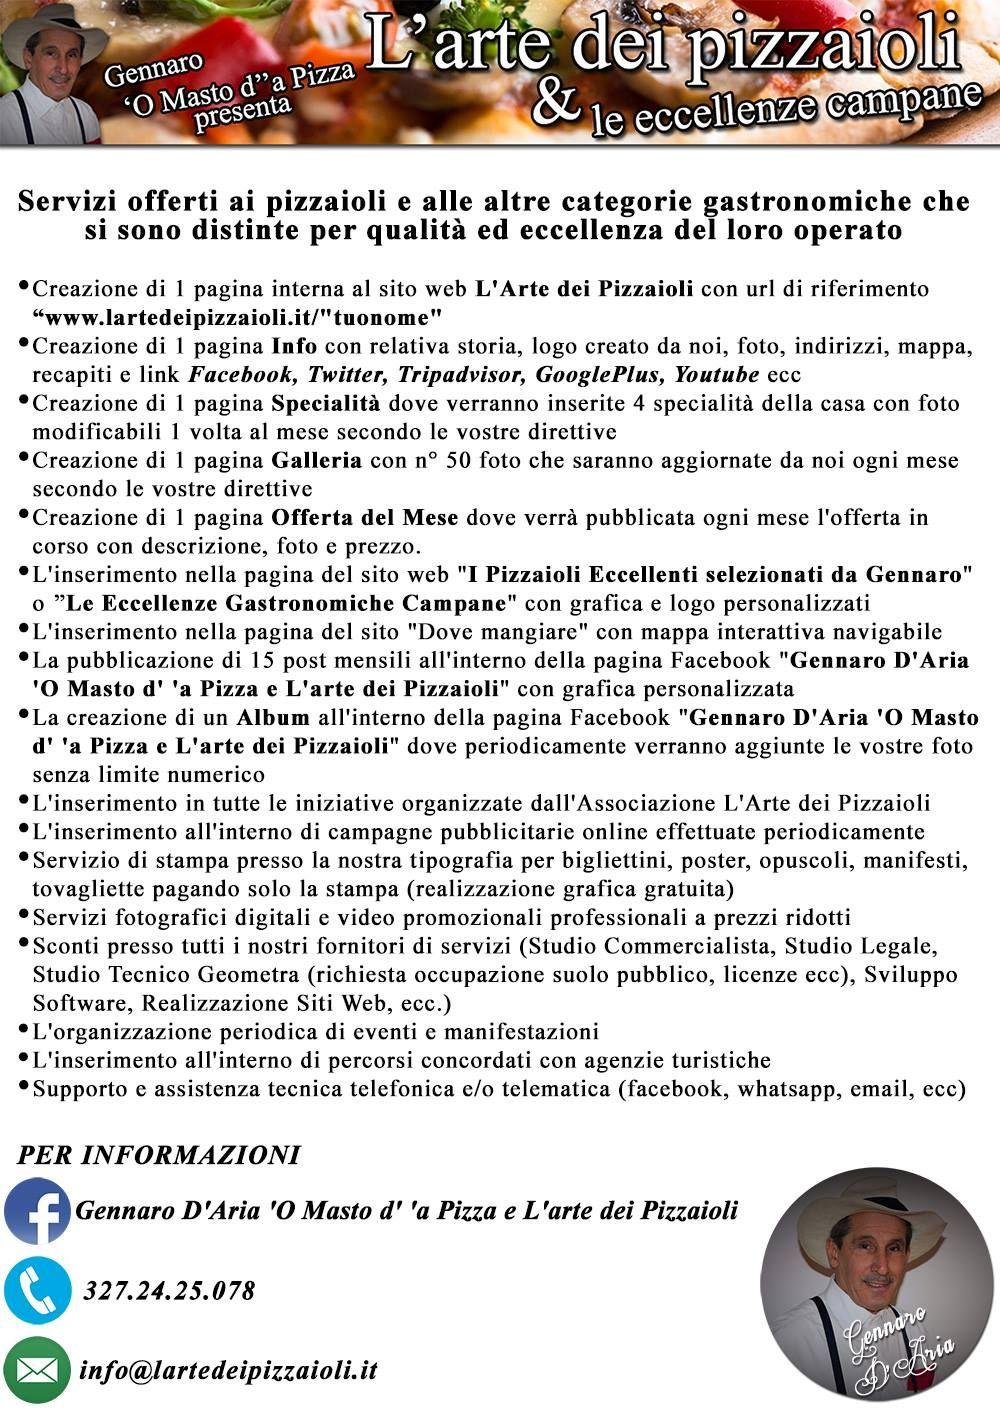 http://www.lartedeipizzaioli.it/